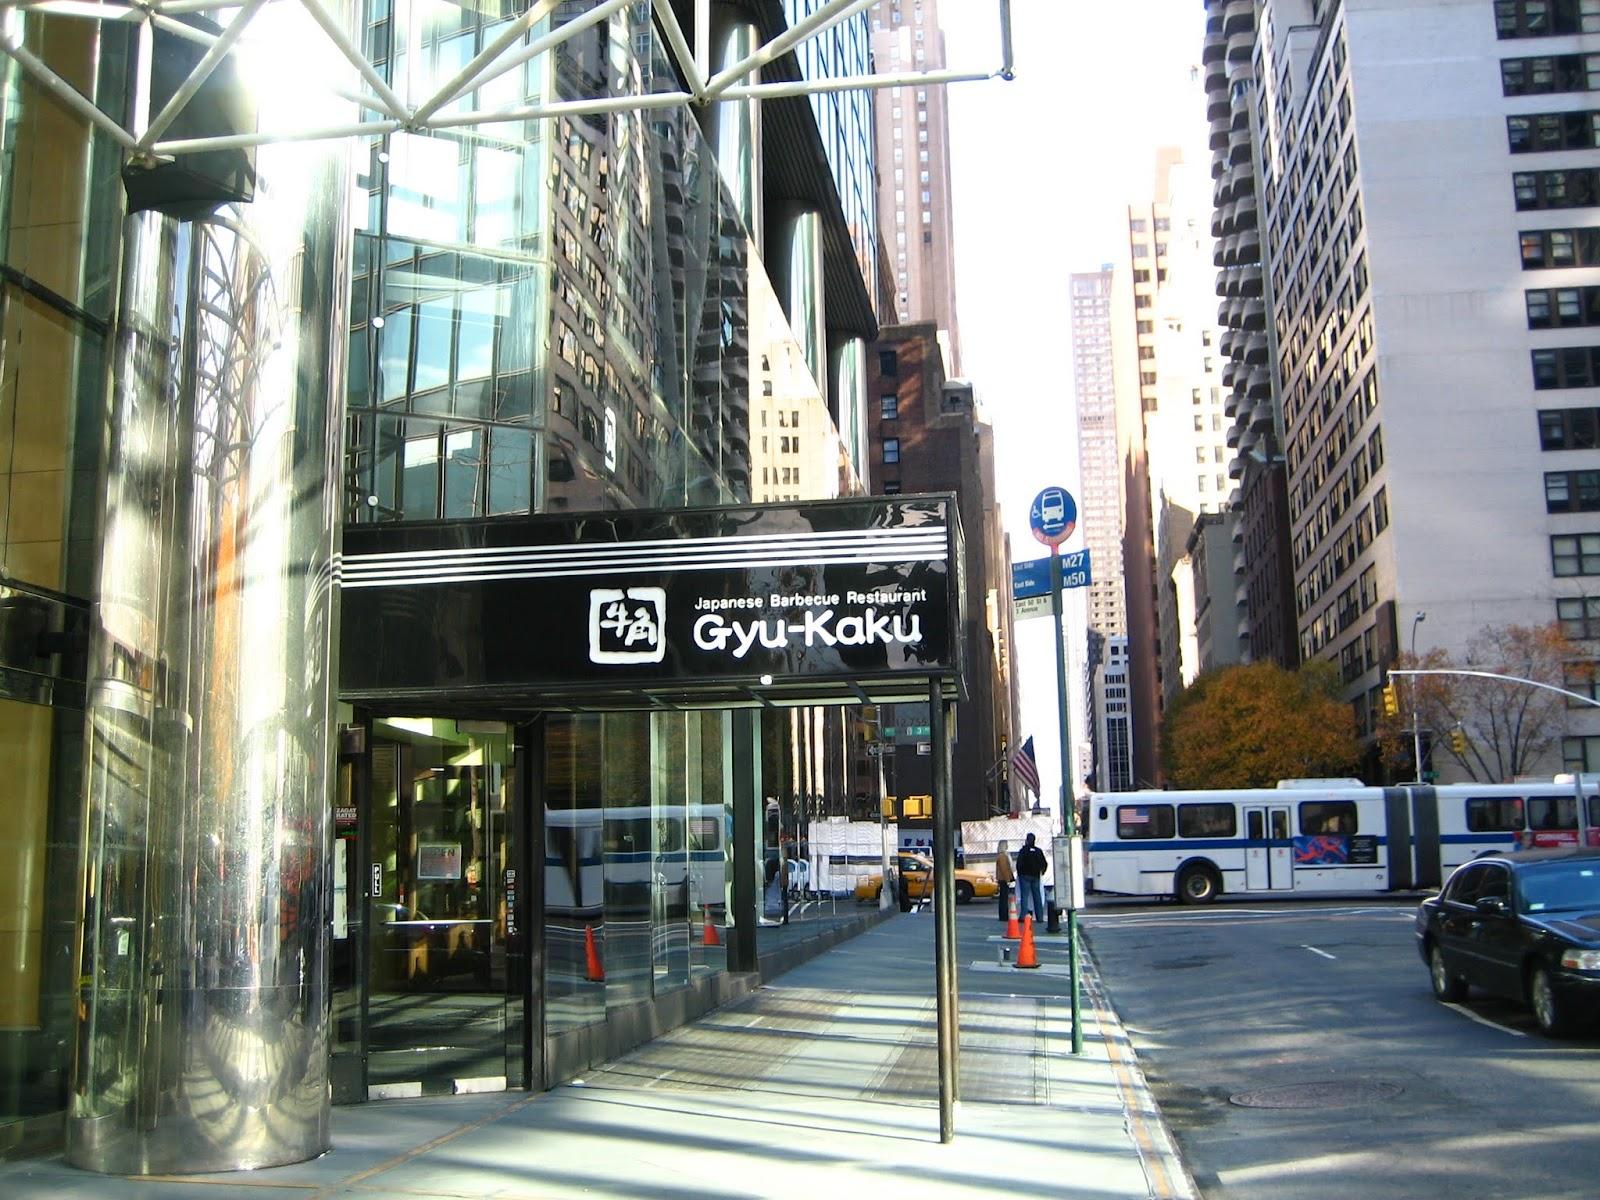 Gyu-Kaku-NY 牛角ニューヨーク店